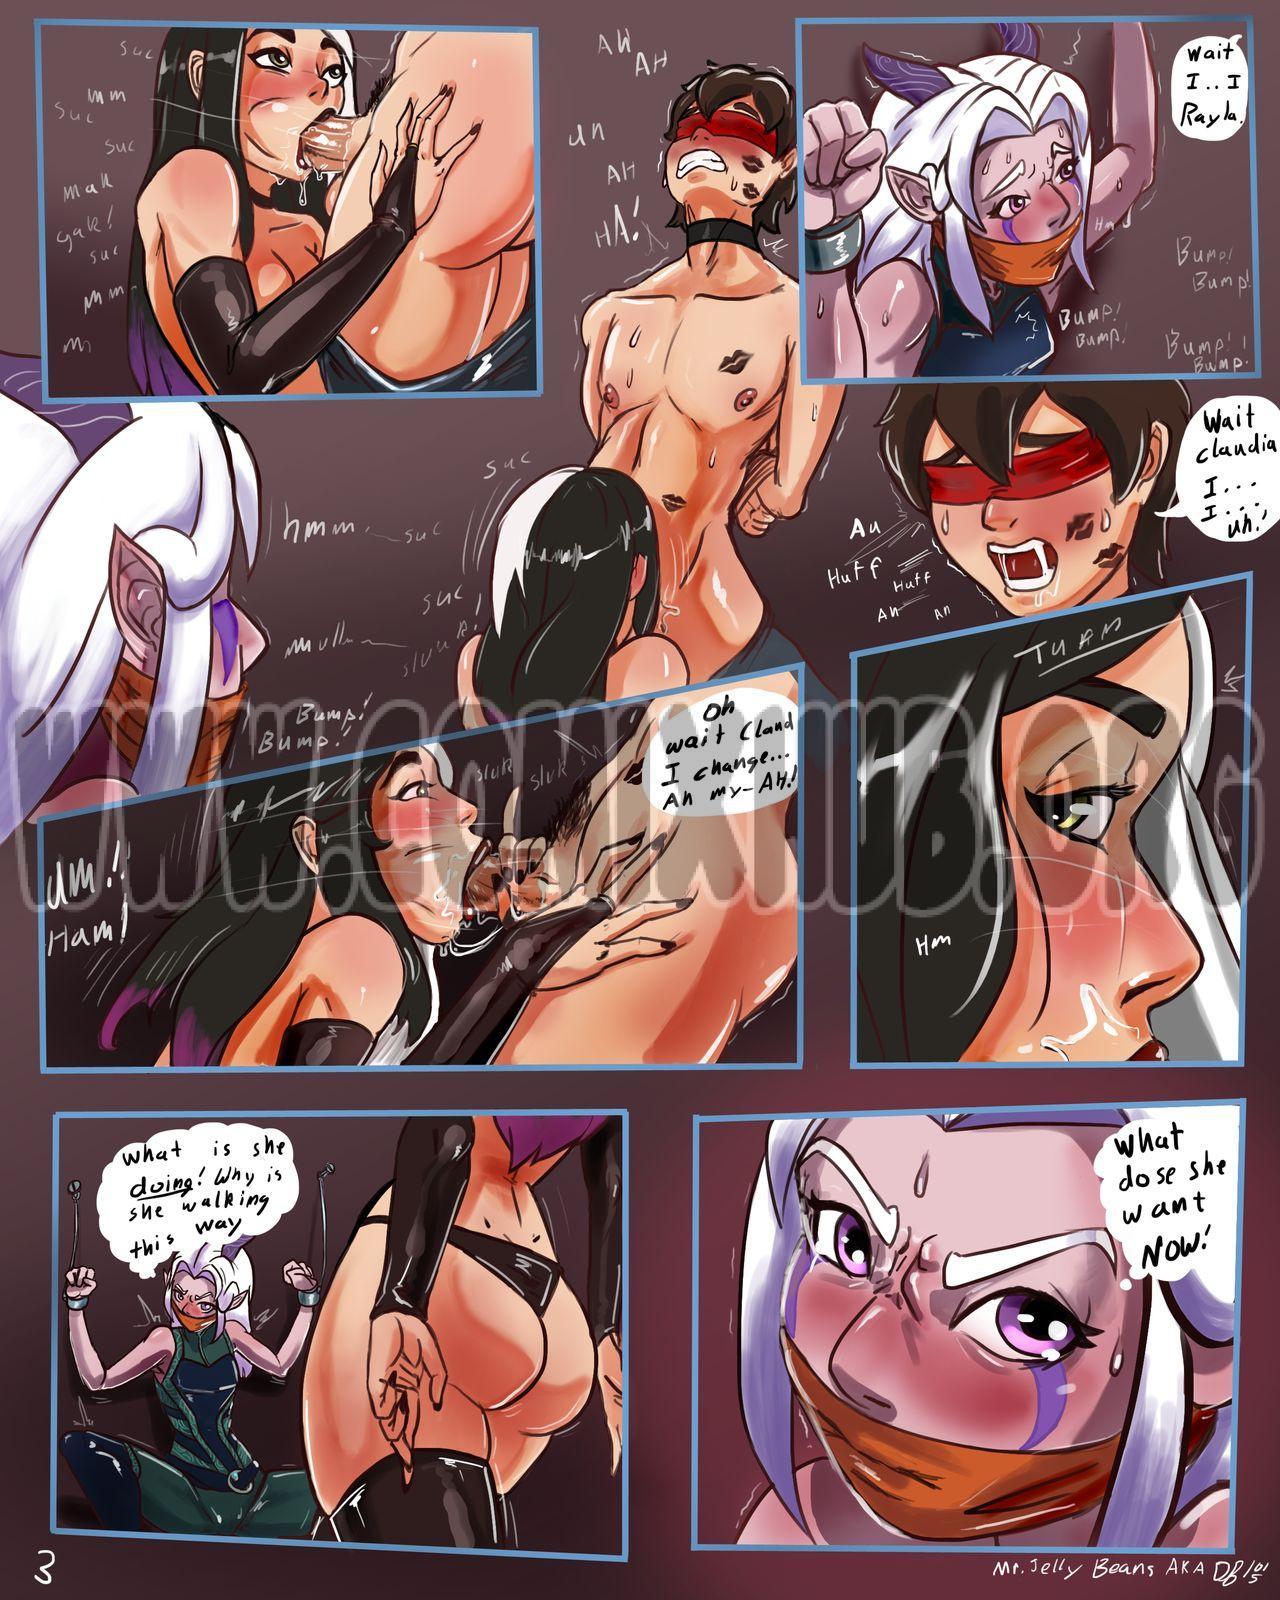 2 Girls 1 Prince porn comics Oral sex, Big Tits, Straight, Straight Shota, Threesome, X-Ray